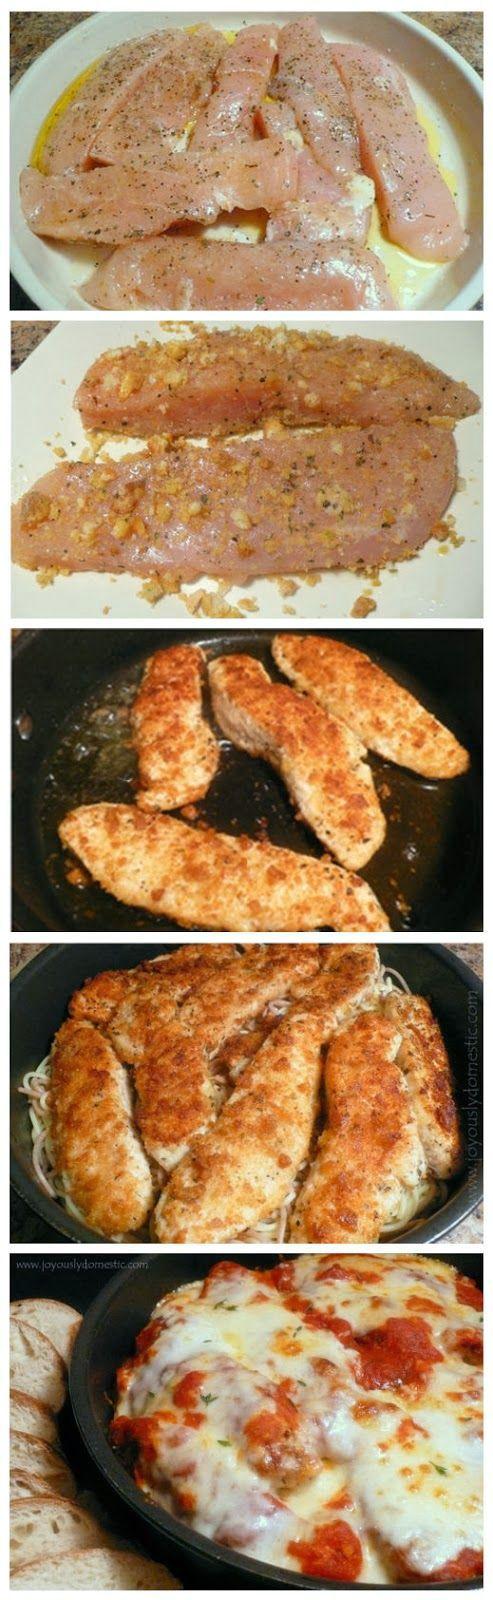 Skillet Chicken Parmesan Over Pasta | Dinner | Pinterest